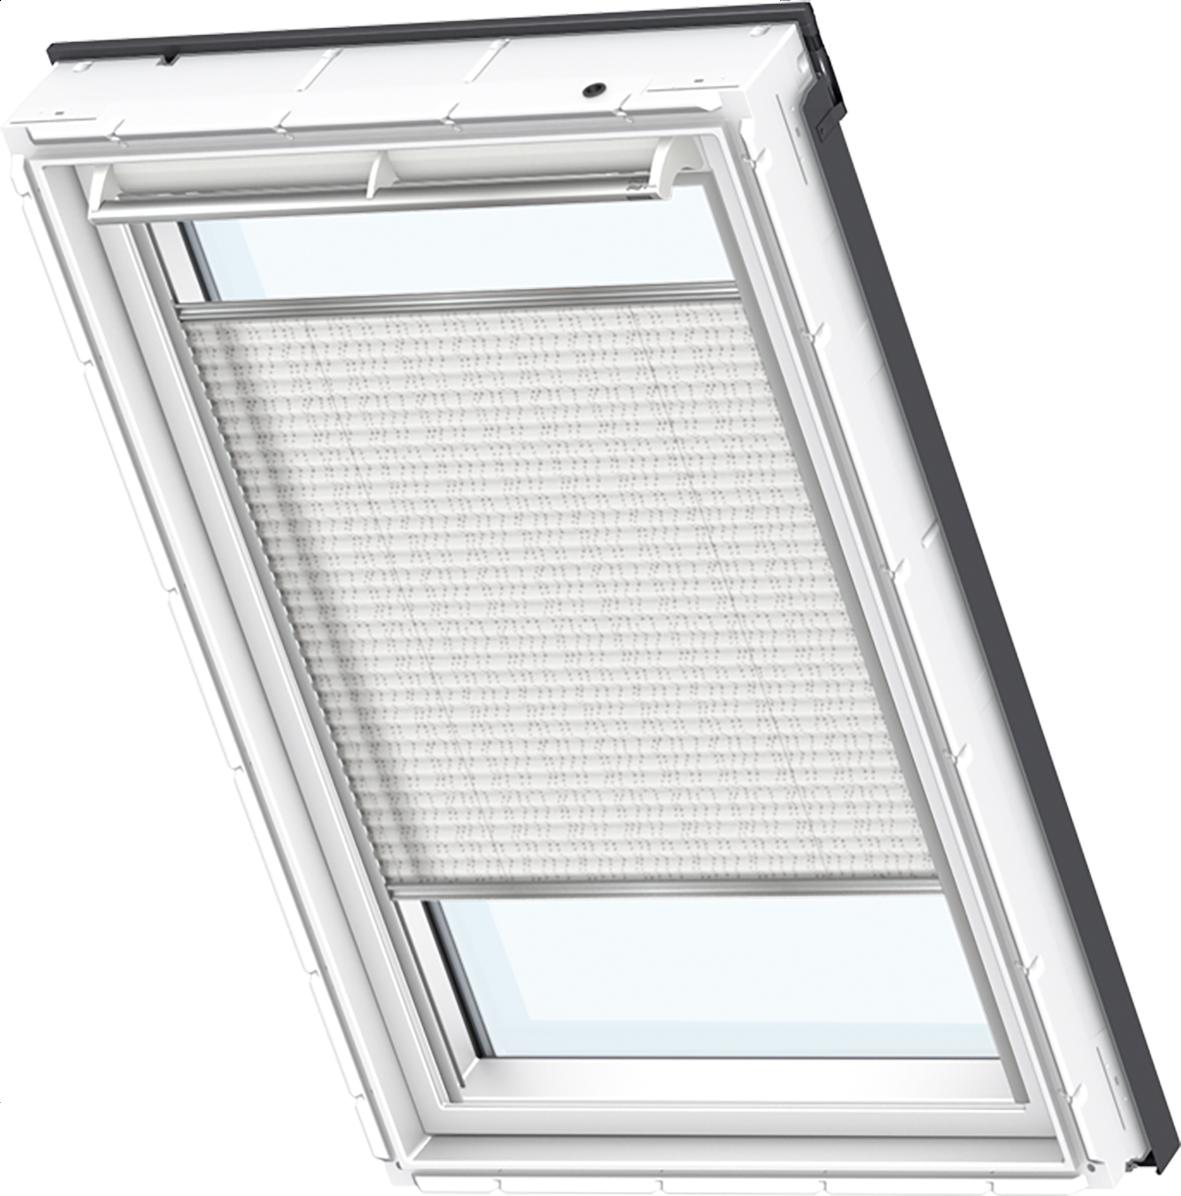 Original Velux Dachfenster Plissee Faltstores Faltrollo Faltrollo Faltrollo 1255 1256 1257 VL VU VKU   New Product 2019  00d8c5